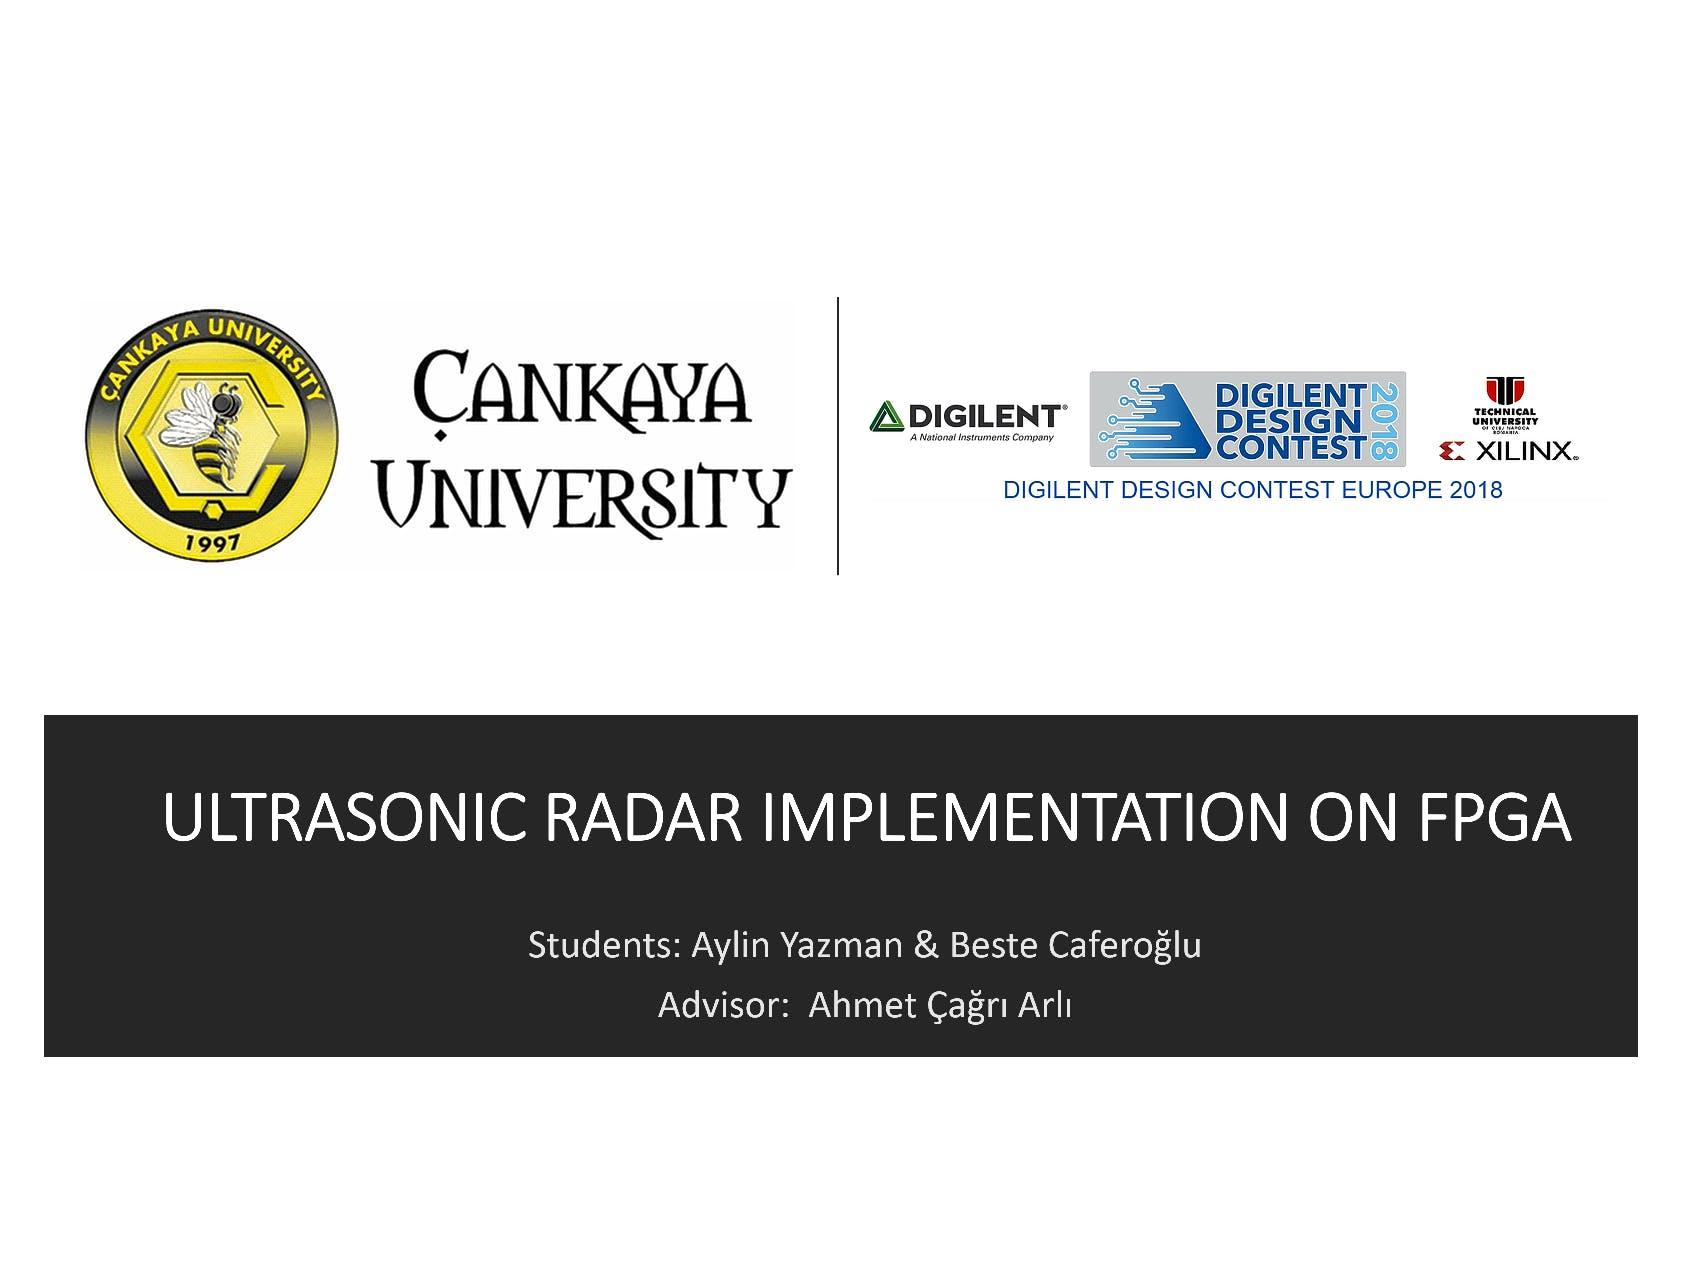 Final: Ultrasonic Radar Implementation on FPGA